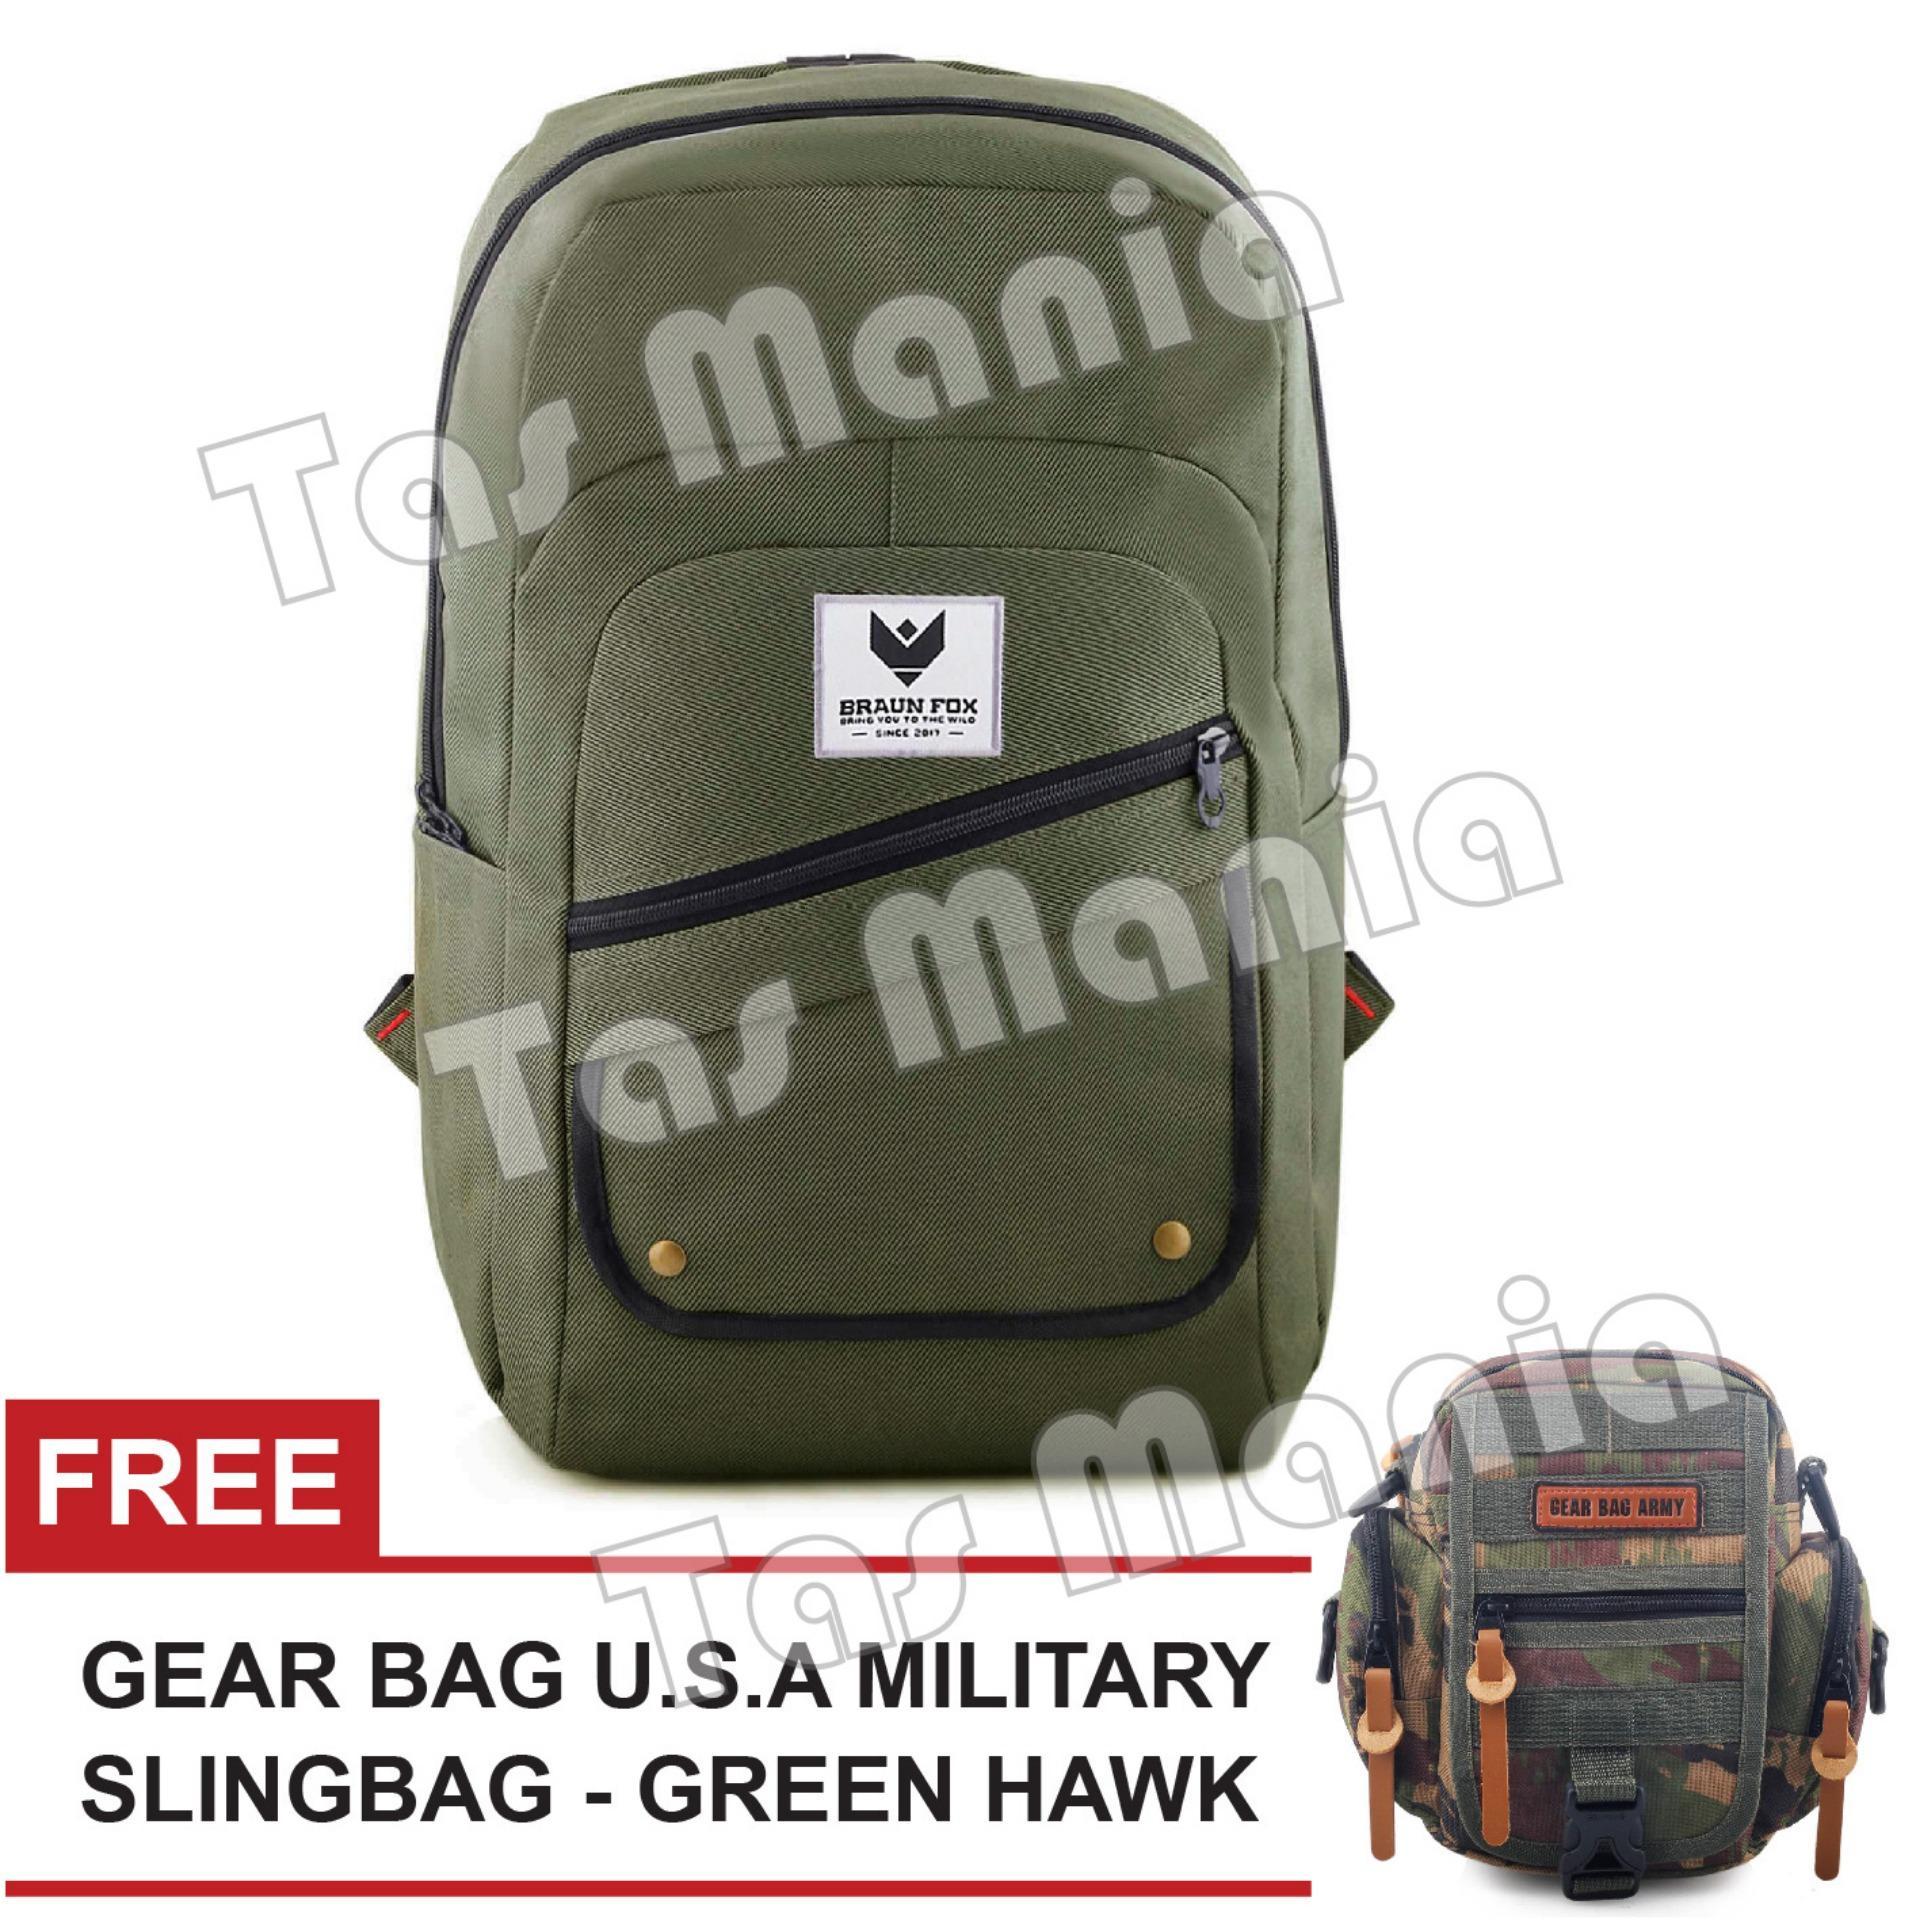 Tas Ransel Pria Braun Fox Jester X Casual Dailypack Laptop Backpack - Green + FREE Tas Selempang Gear Bag U.S.A Military - Green Hawk Promo Diskon Murah Tas Kerja Kantor Kuliah Anti Air Termurah Terlaris Best Seller